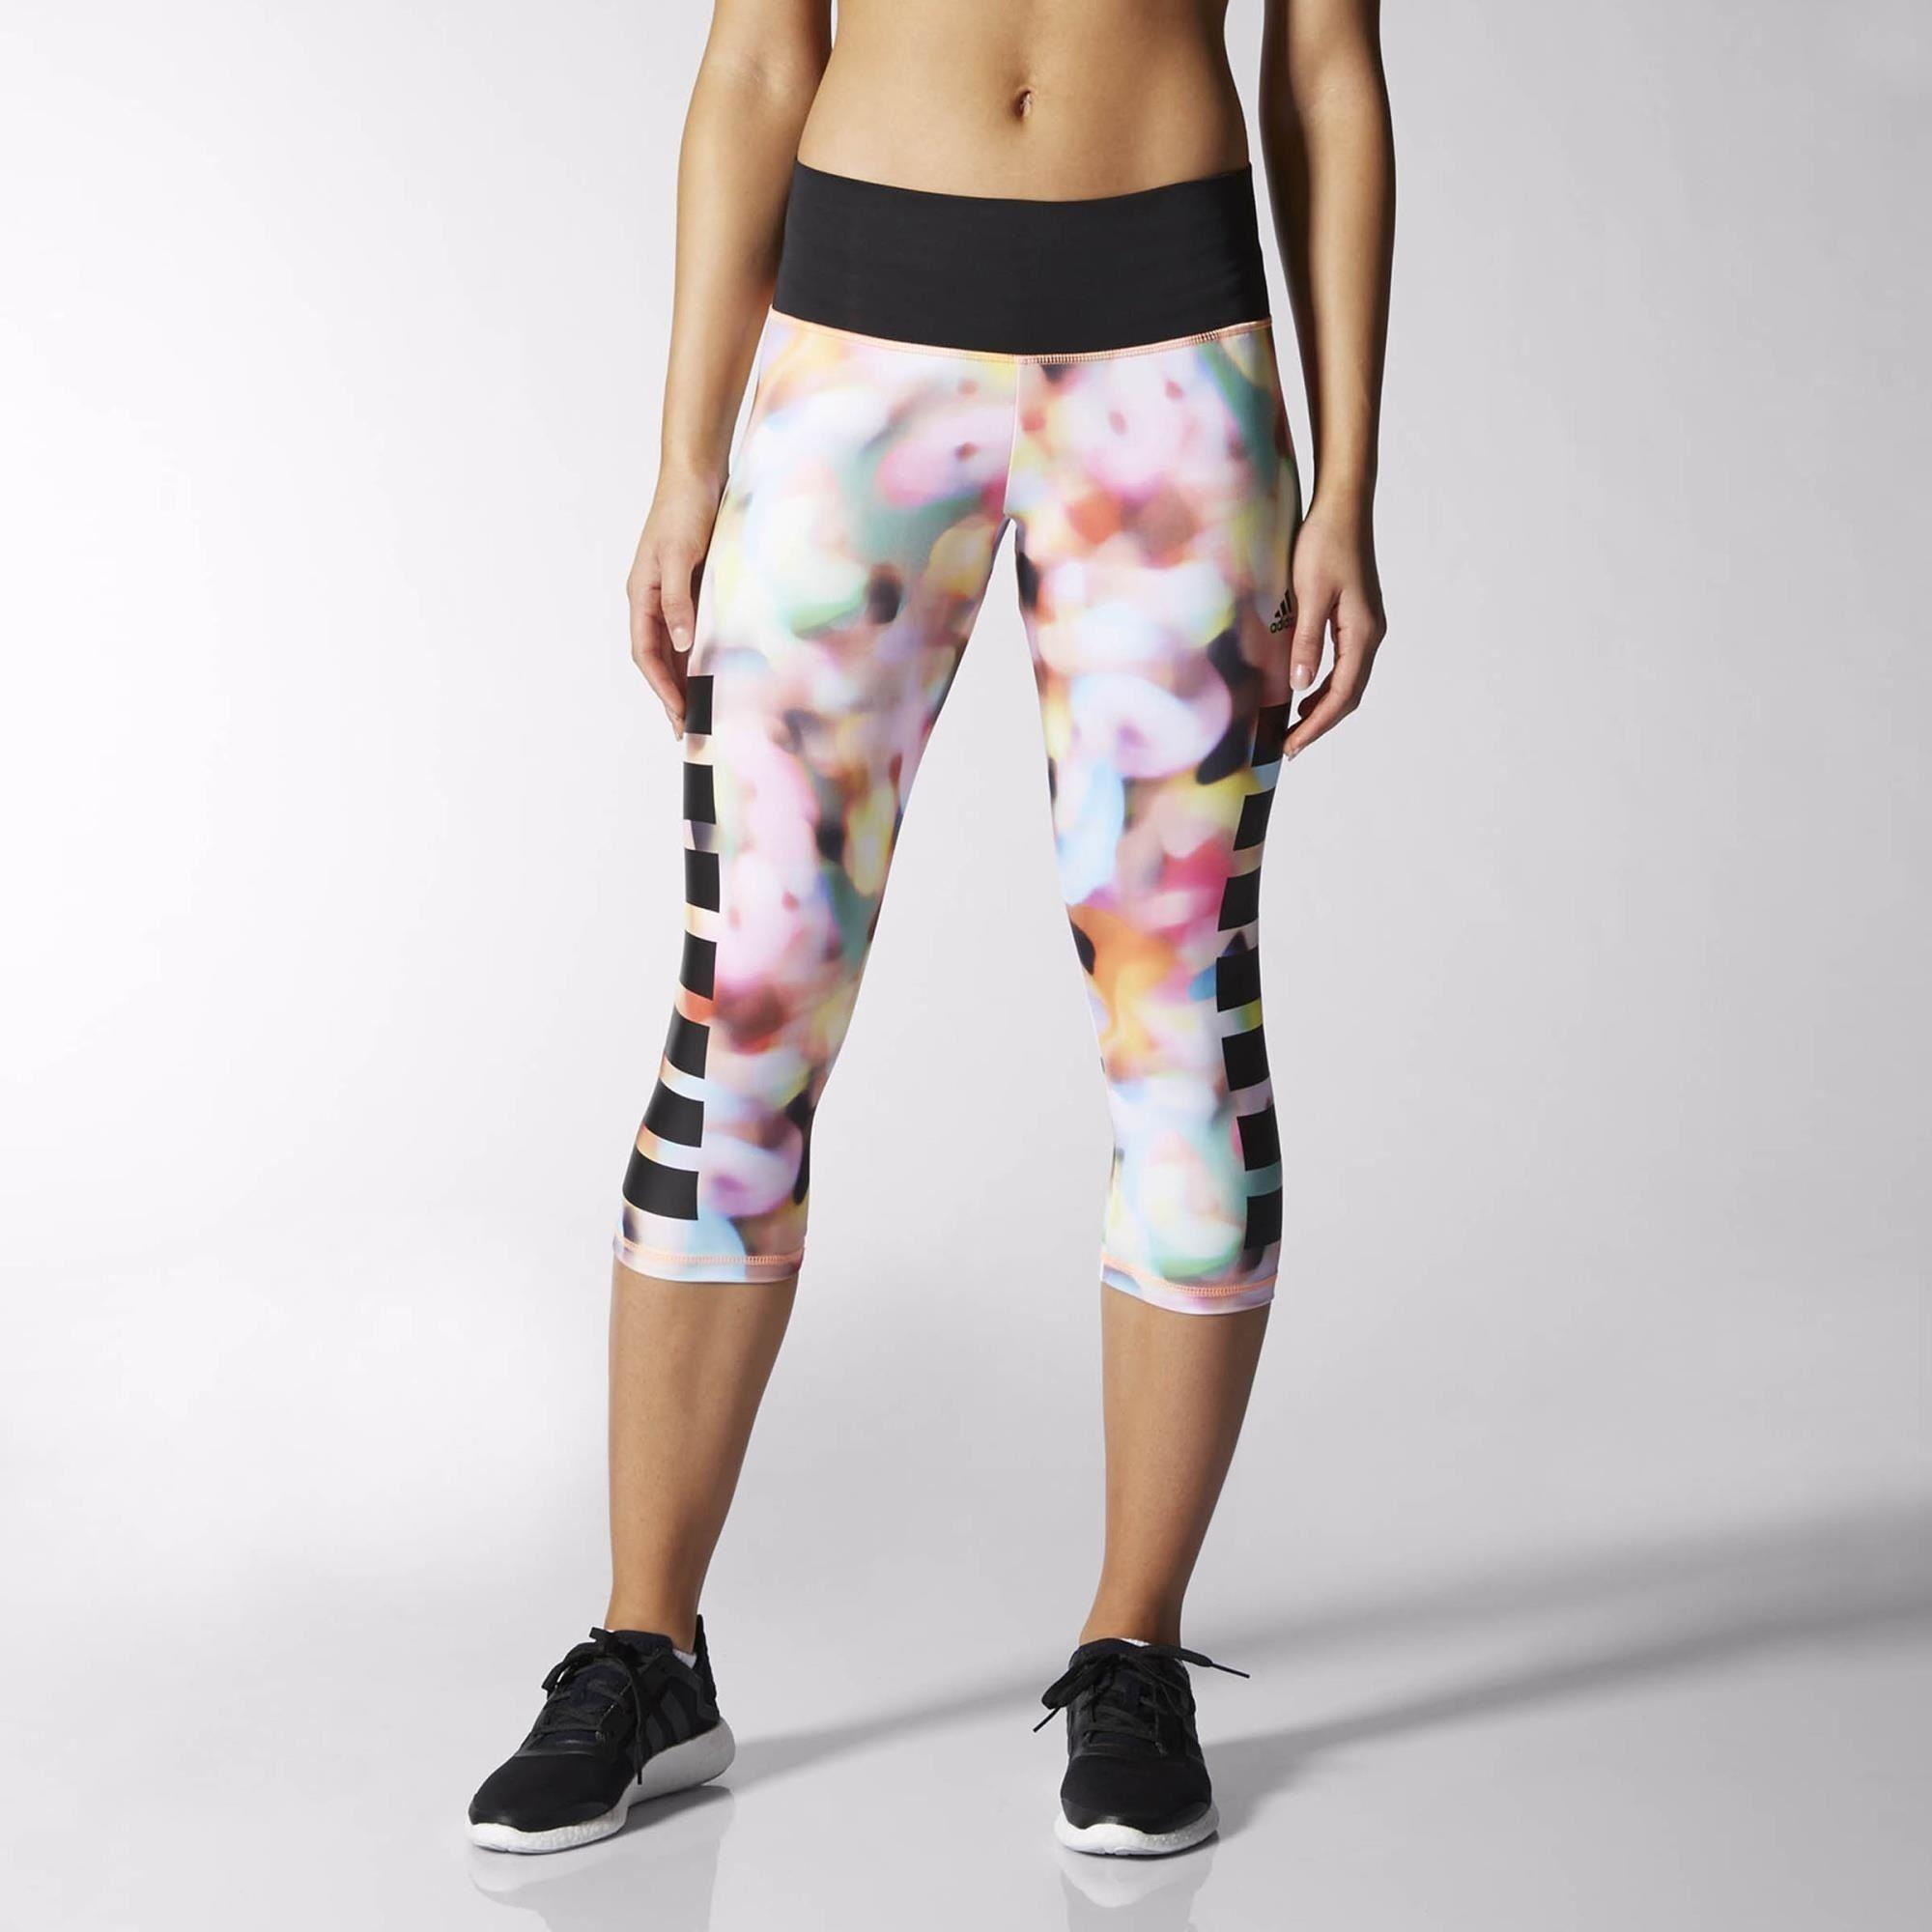 f6bc489182ec Adidas Infinite Series Techfit Women s Capri Running Tights - AW15   Amazon.co.uk  Clothing